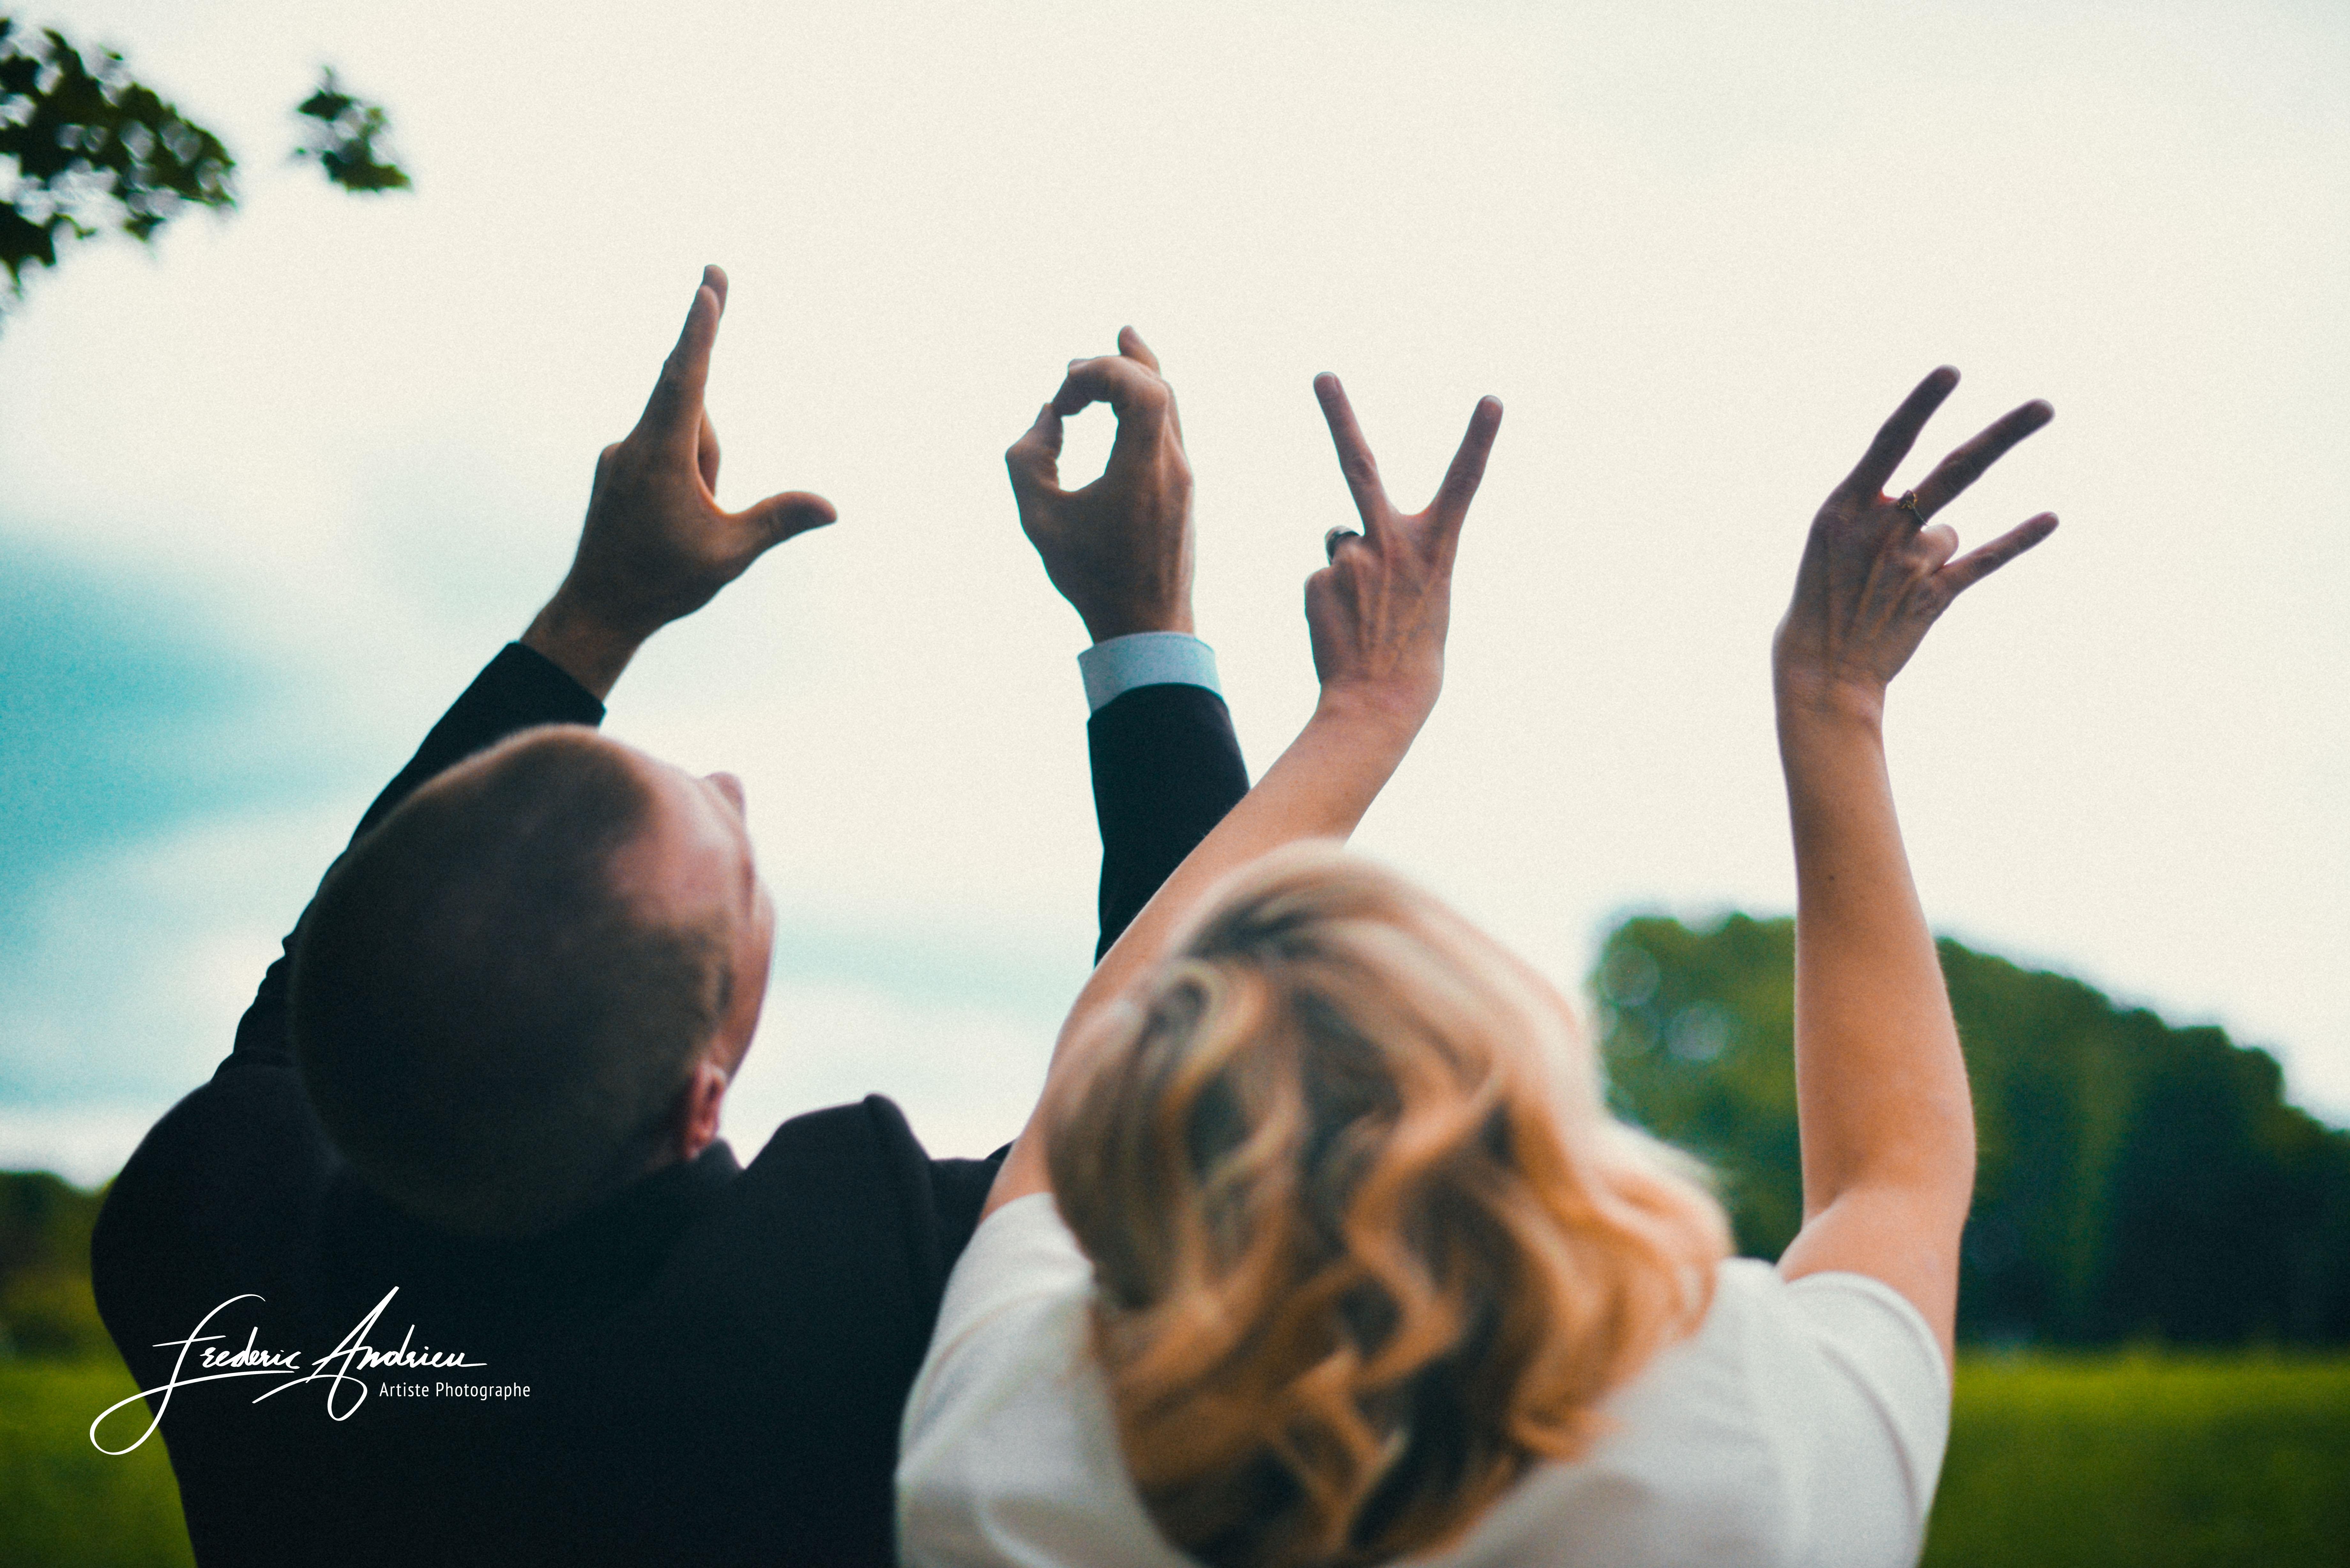 Un mariage en prévision?